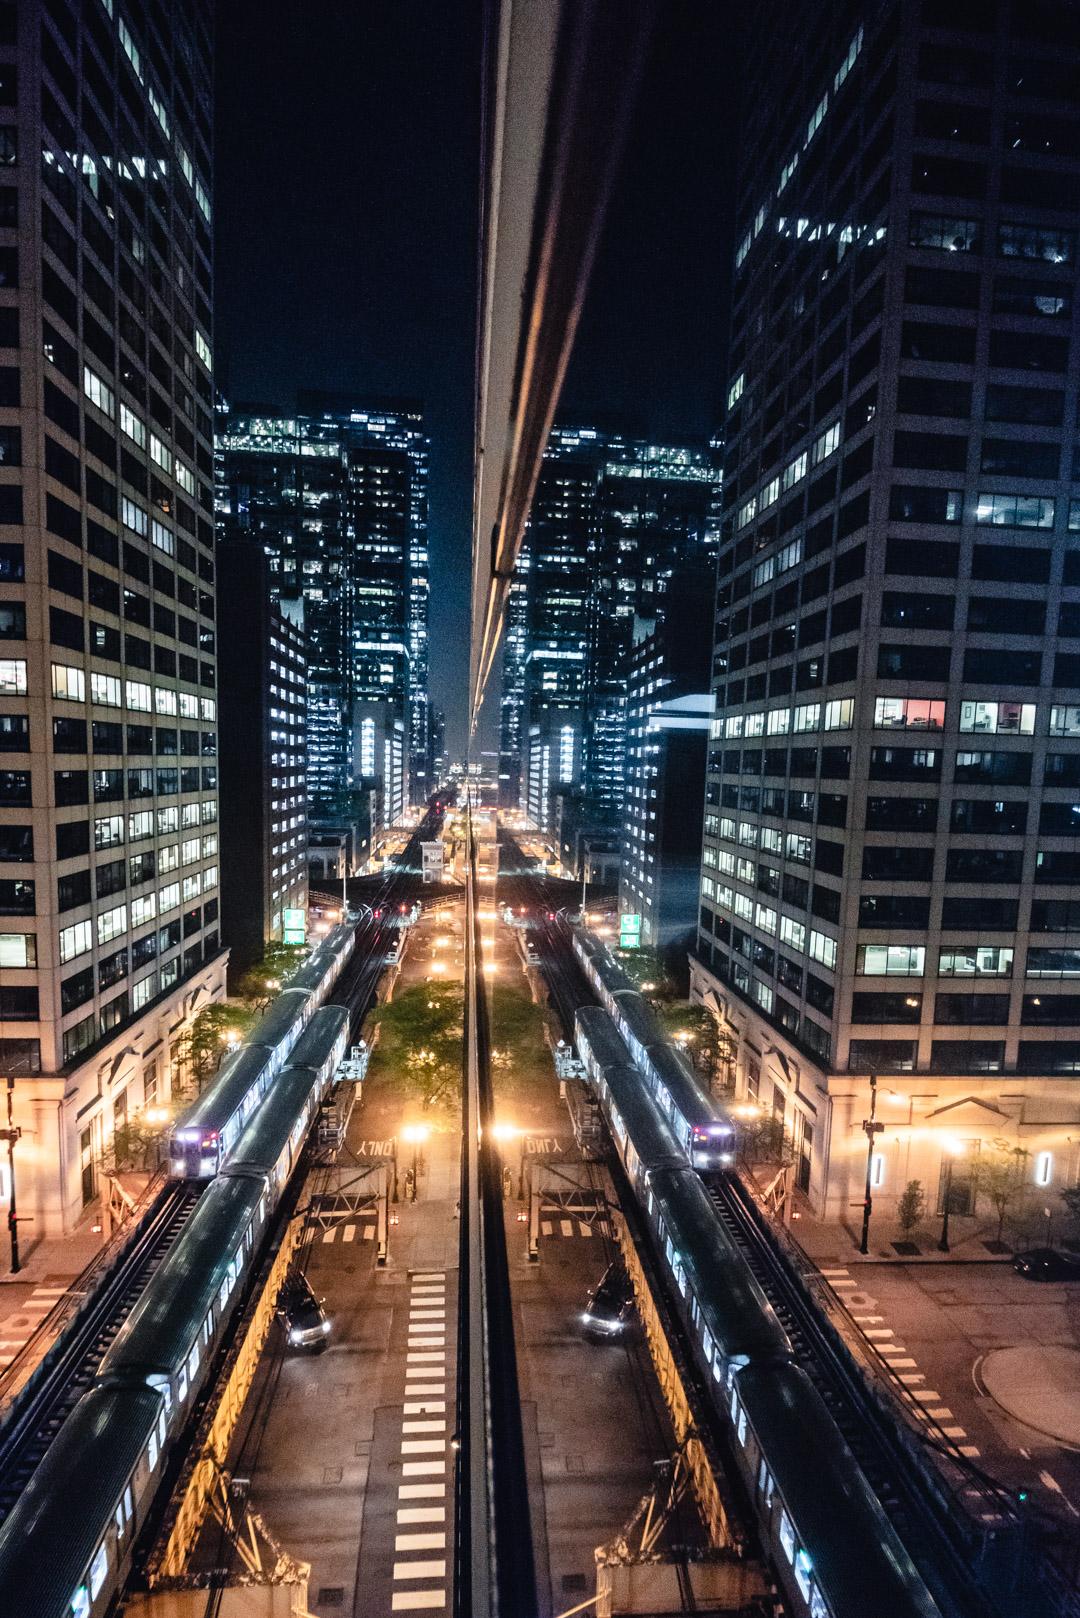 Chicago 200 N Clark St Parking Garage Self Park Deck View Blue Hour Sunset City Illinois Skyline Reflection